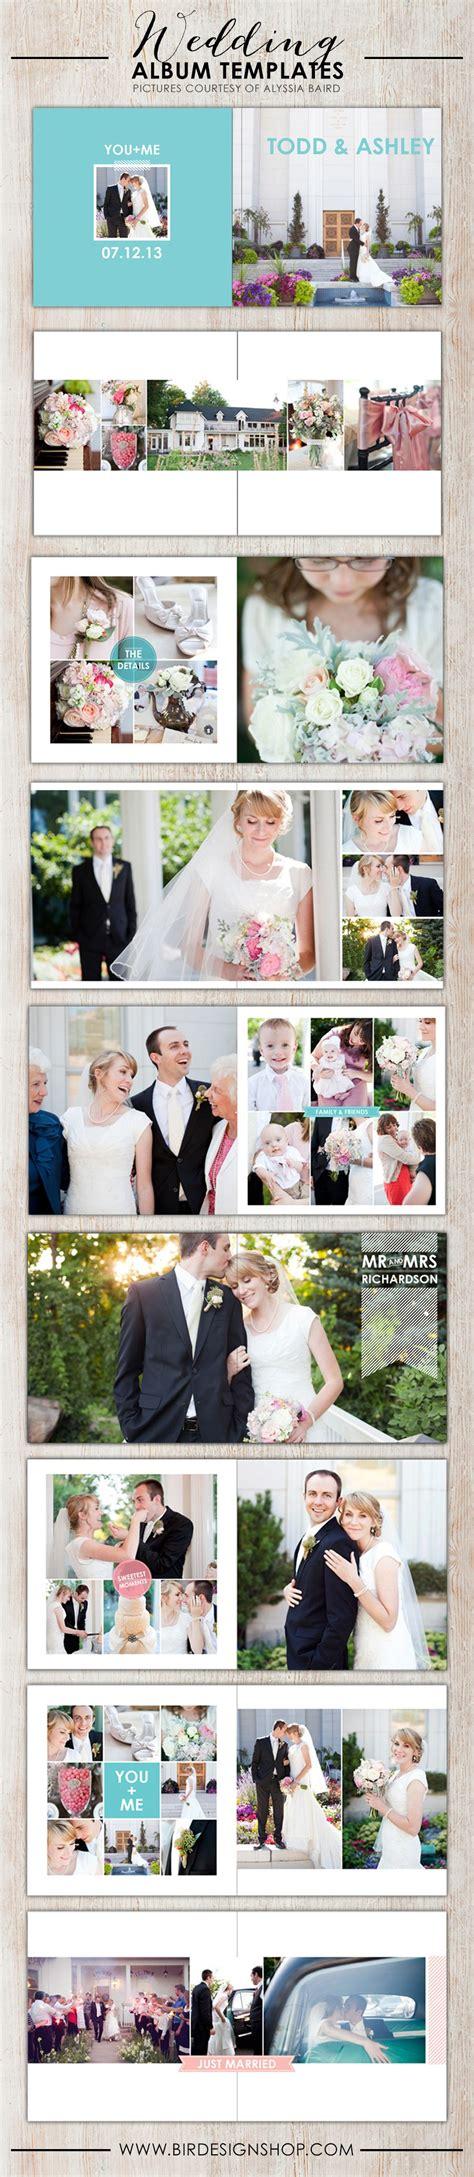 Wedding Album Layout Templates Photoshop by Clean Style 12x12 Wedding Album Template Photoshop